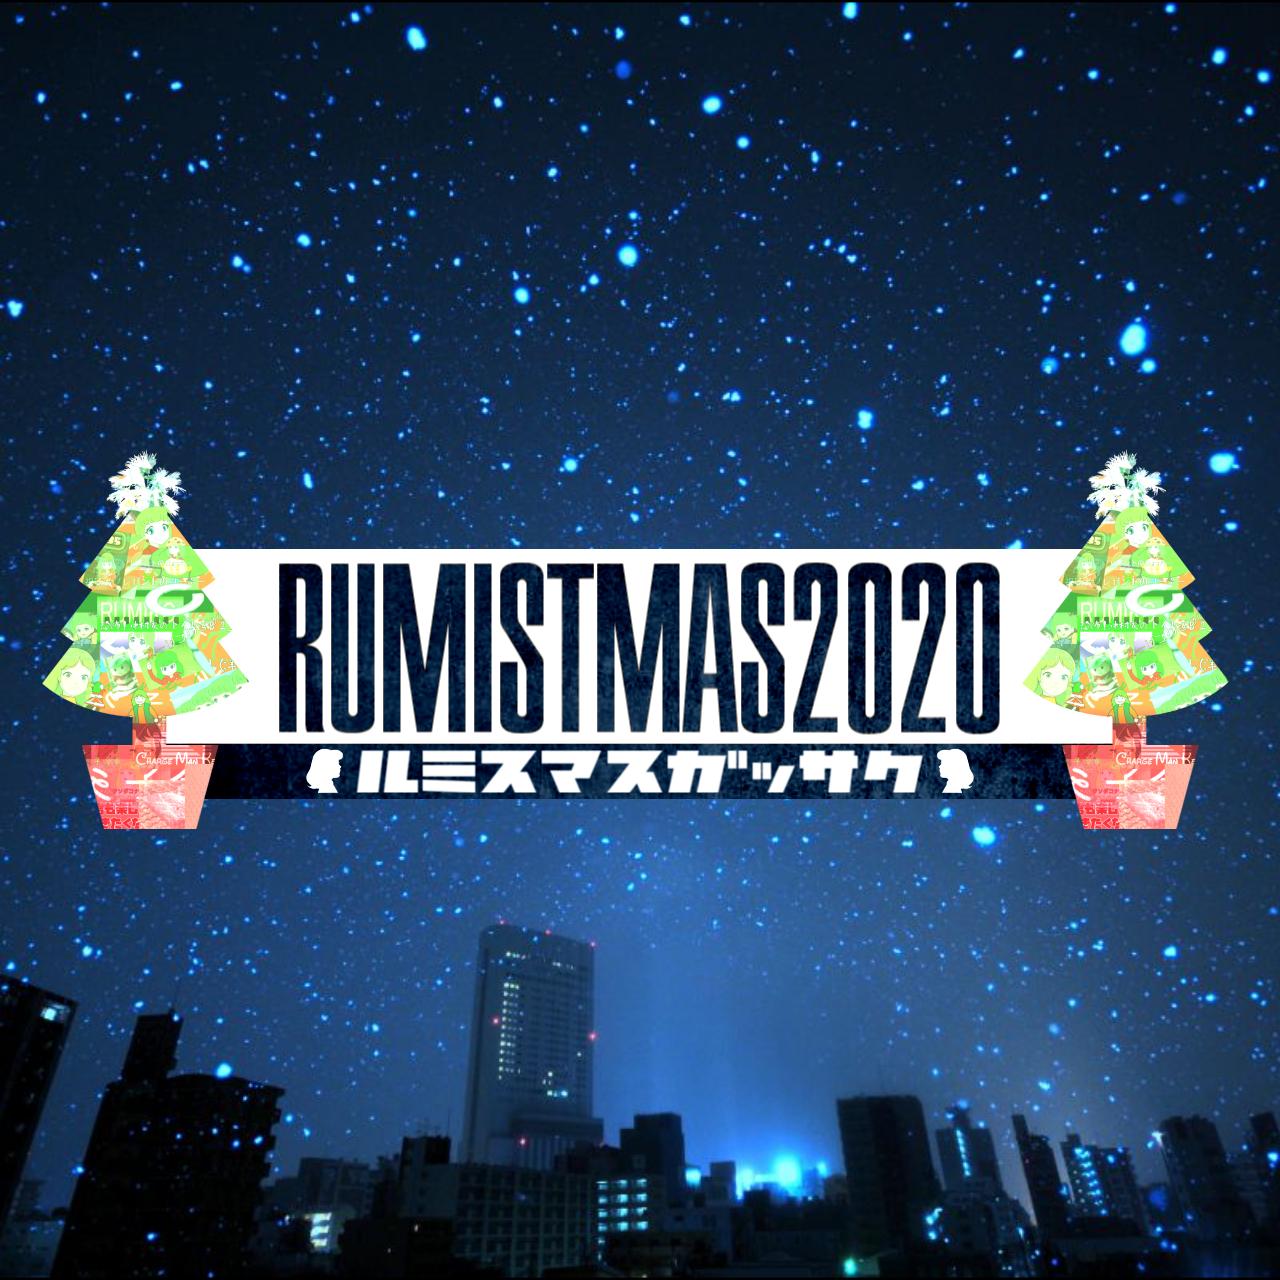 rumistmas02